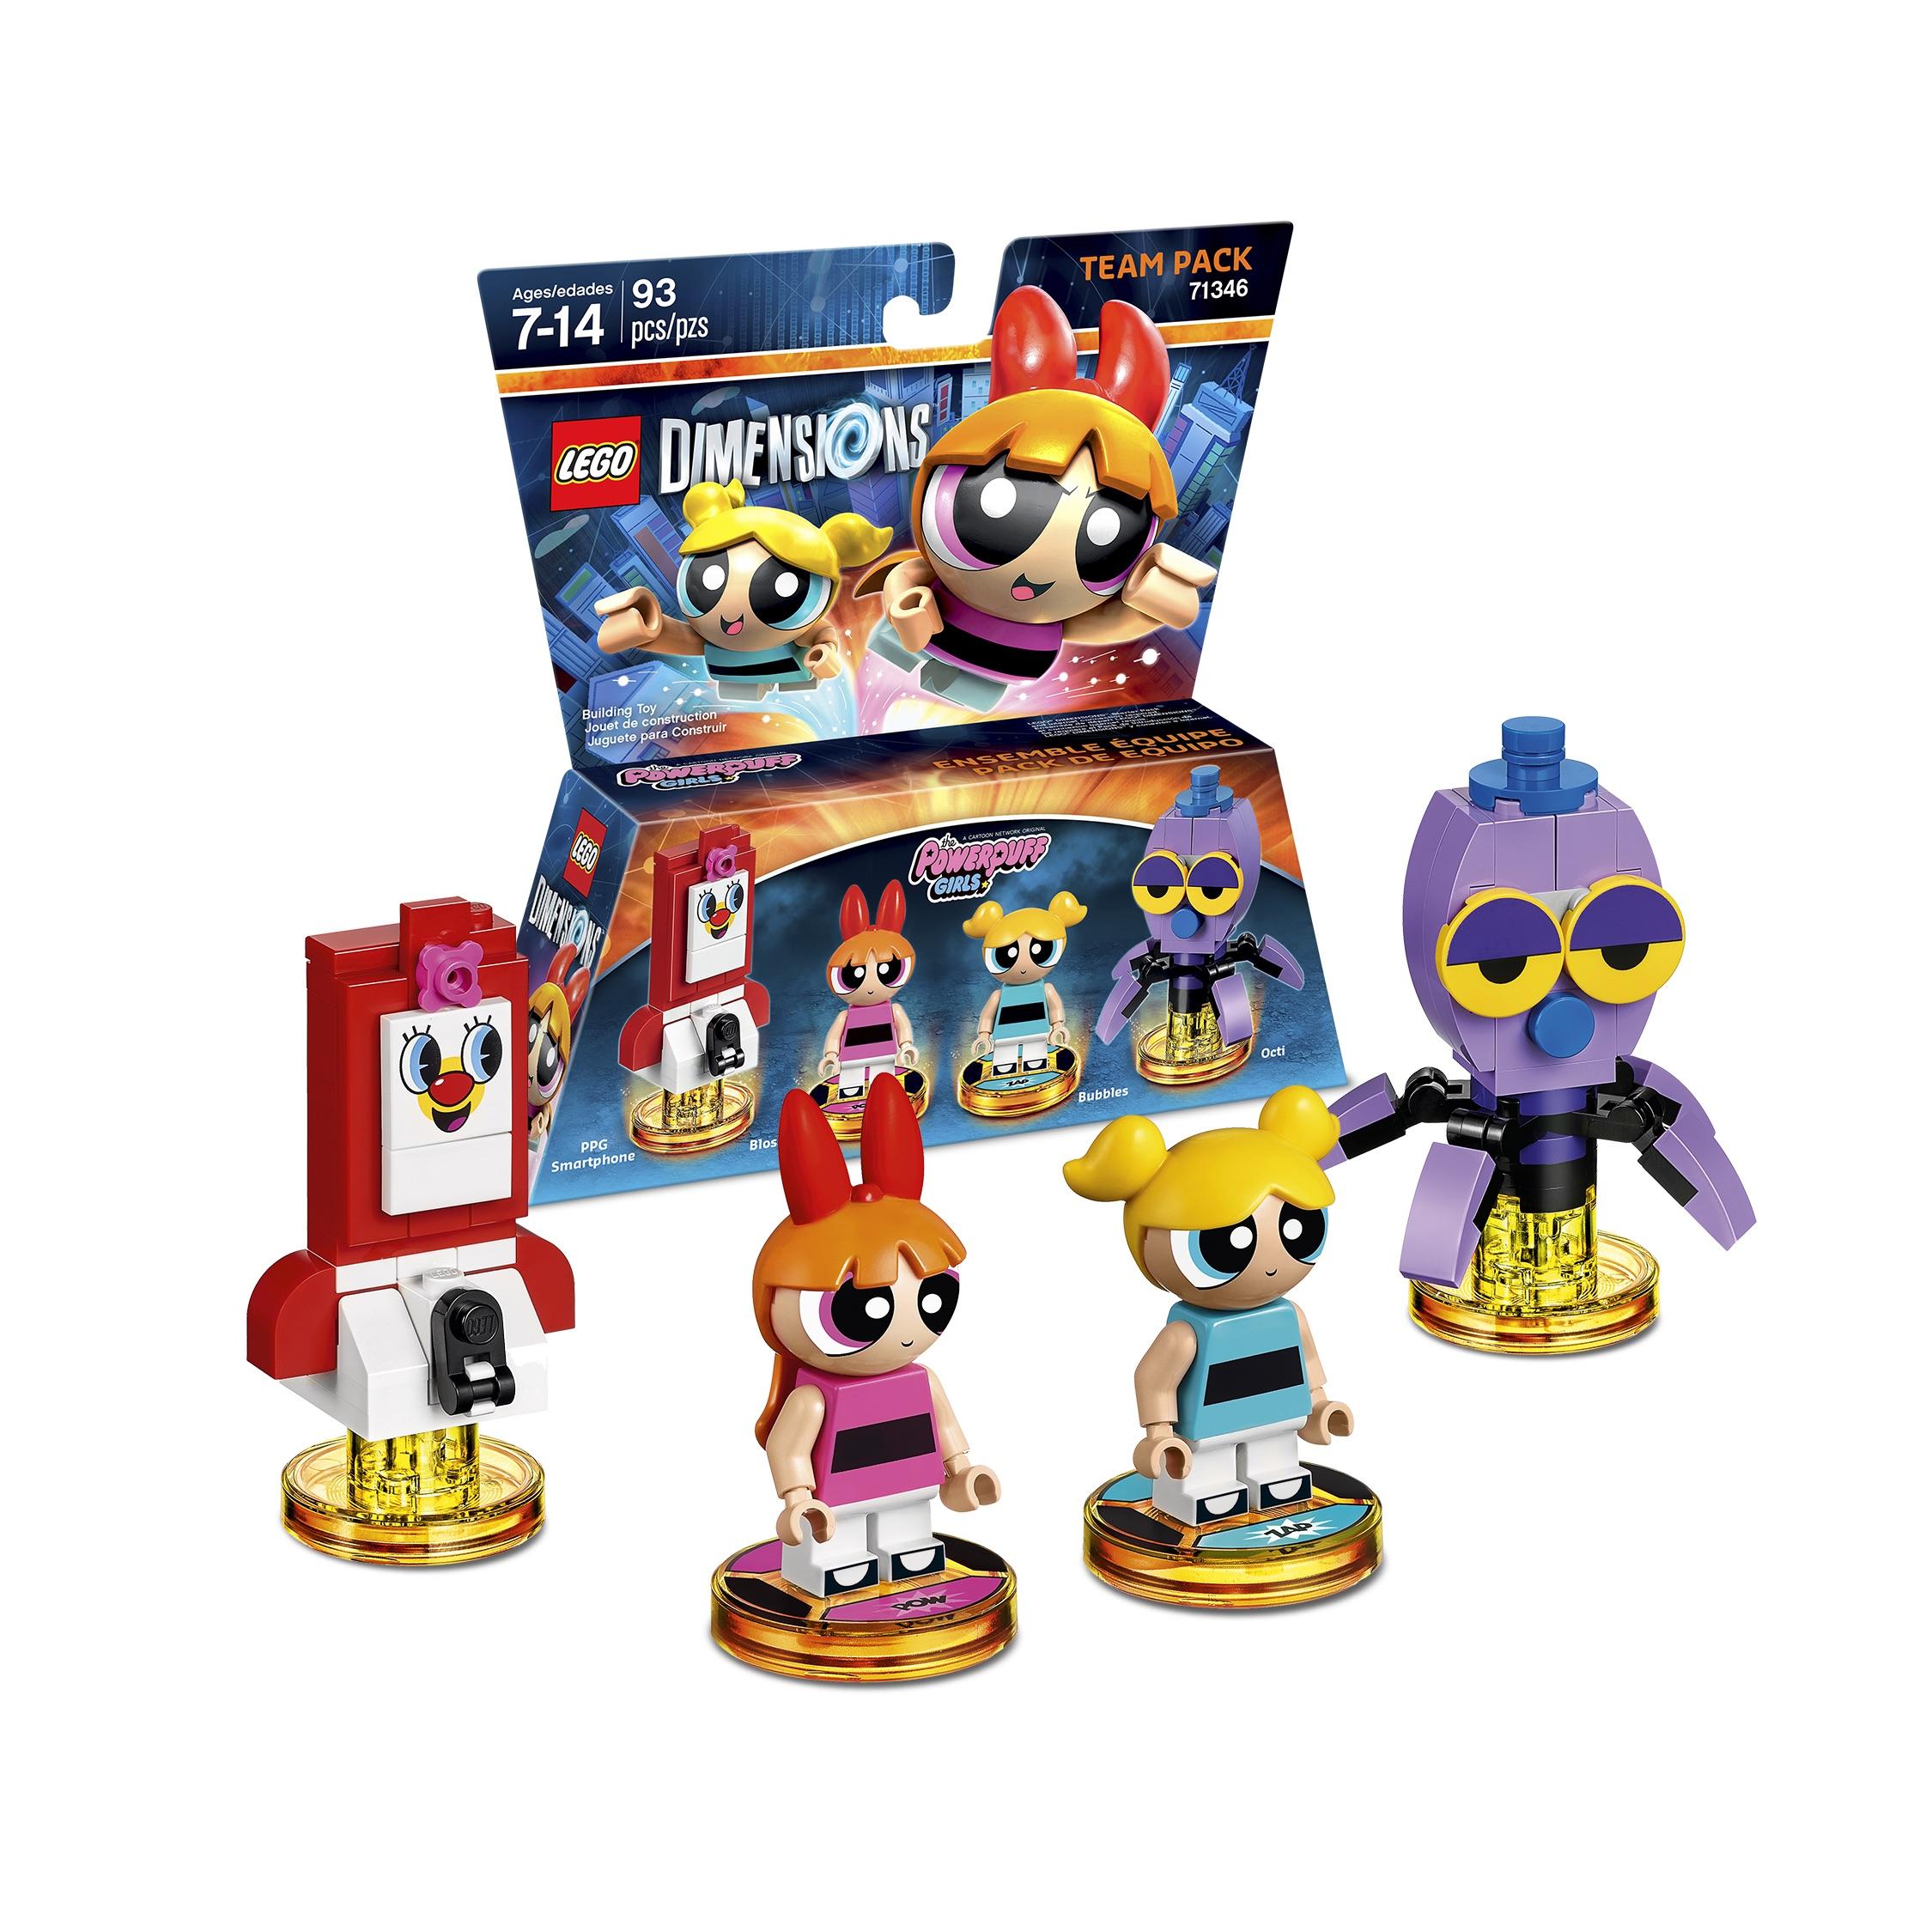 LEGO Dimensions - The Powerpuff Girls Team Pack